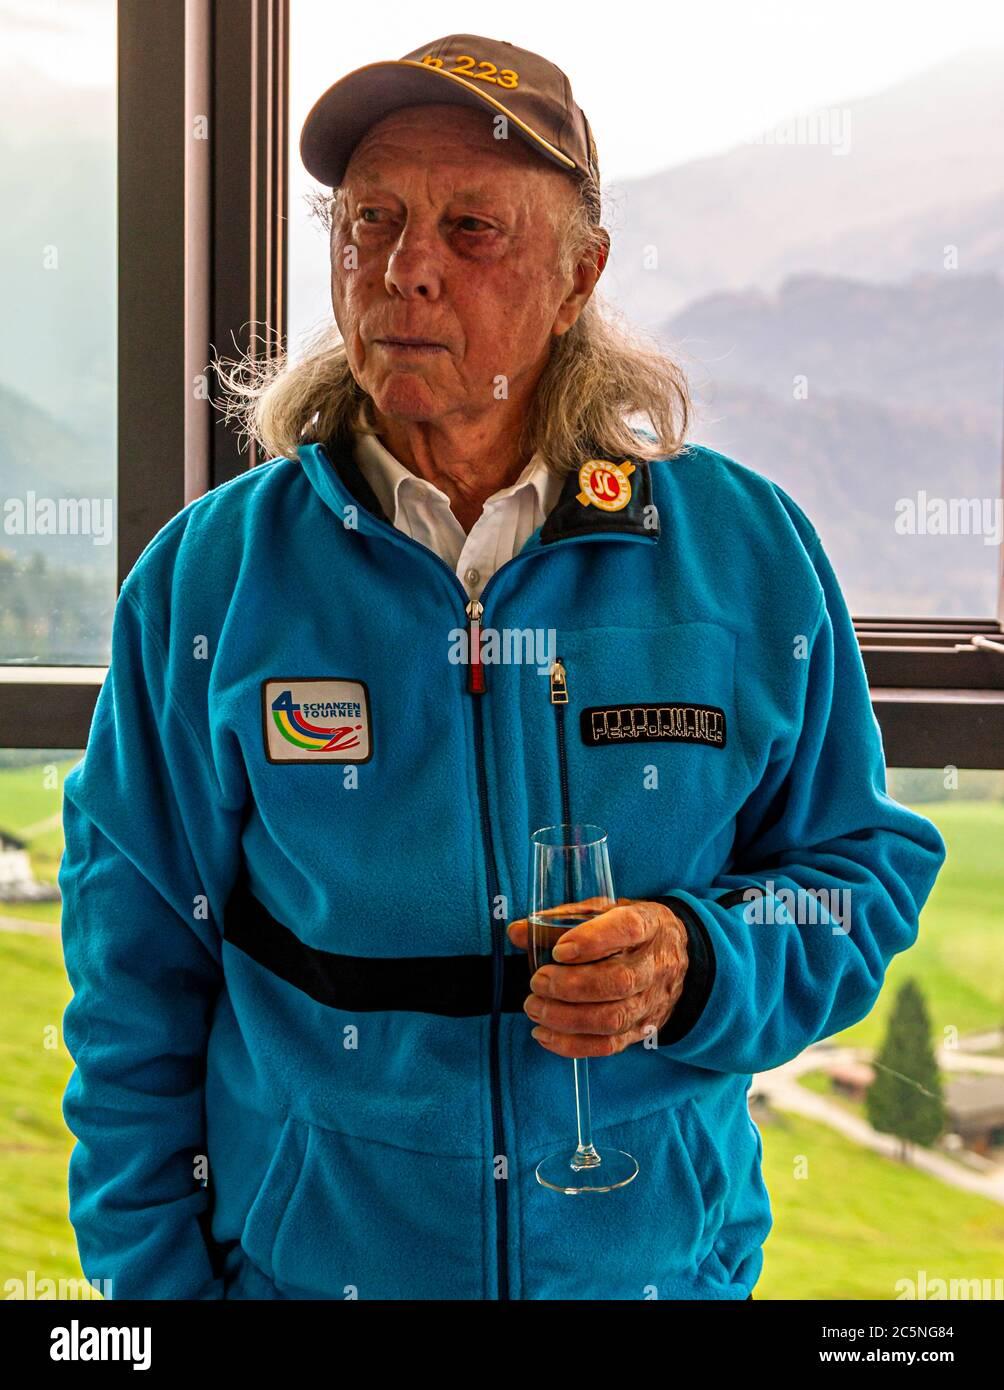 The first German Four Hills Tournament winner Max Bolkhart on the Schattenberg ski jump in Oberstdorf, Germany Stock Photo